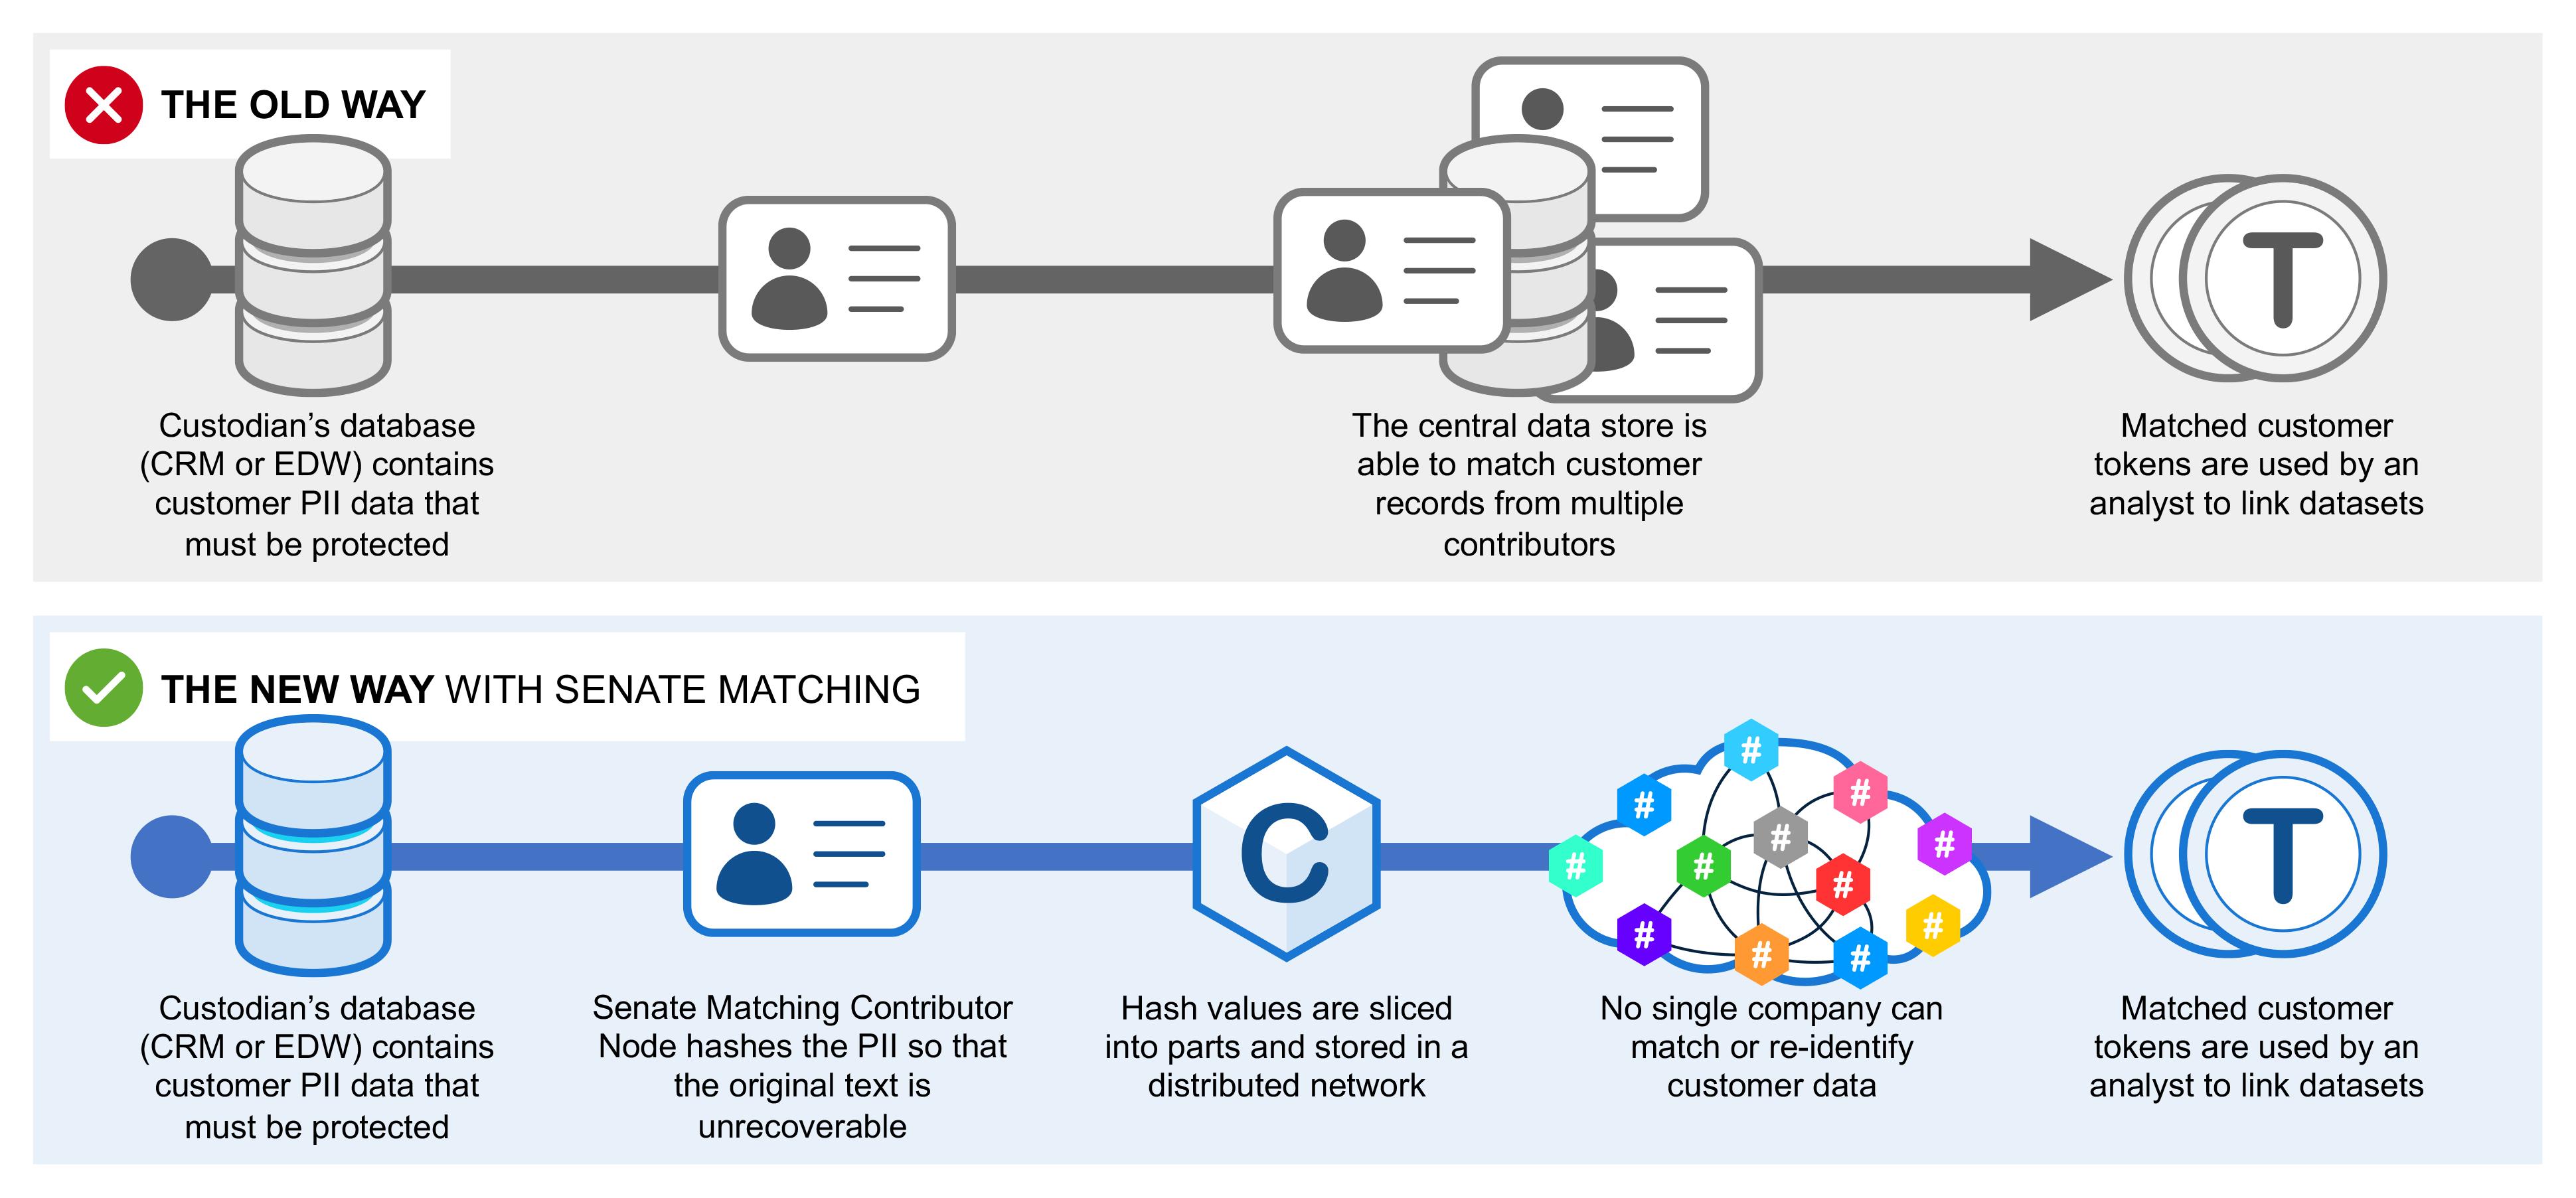 Data Republic Senate Matching decentralized method